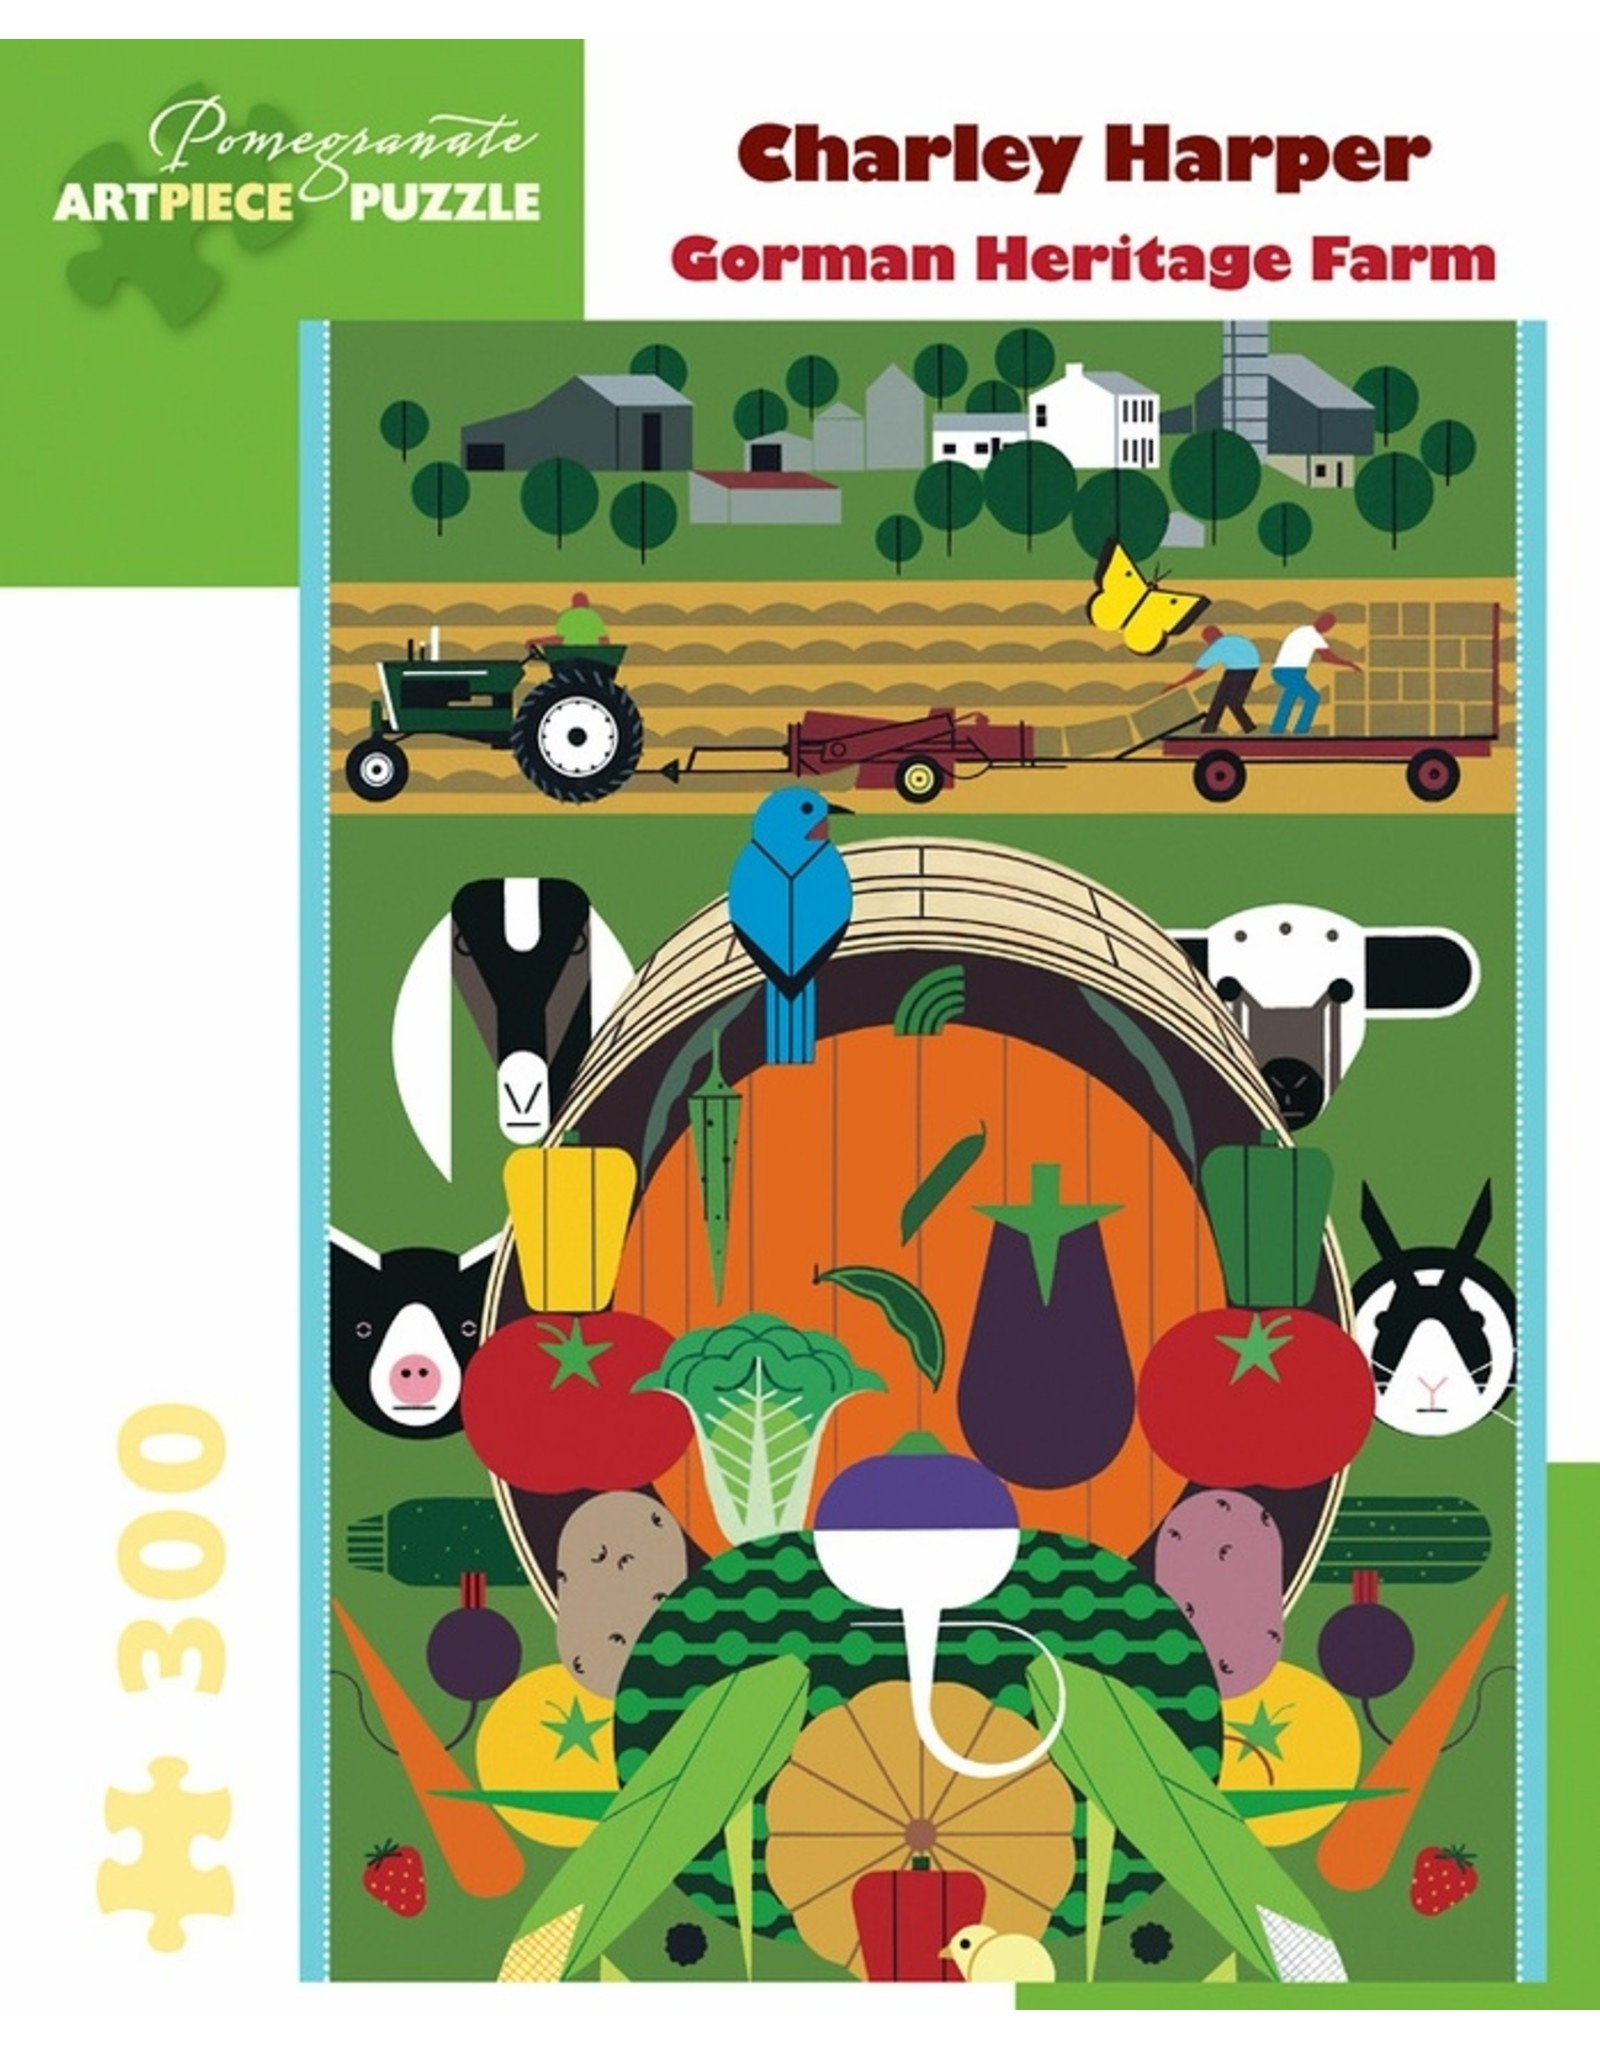 Pomegranate C Harper - Gorman Heritage Farm - 300 Piece Puzzle